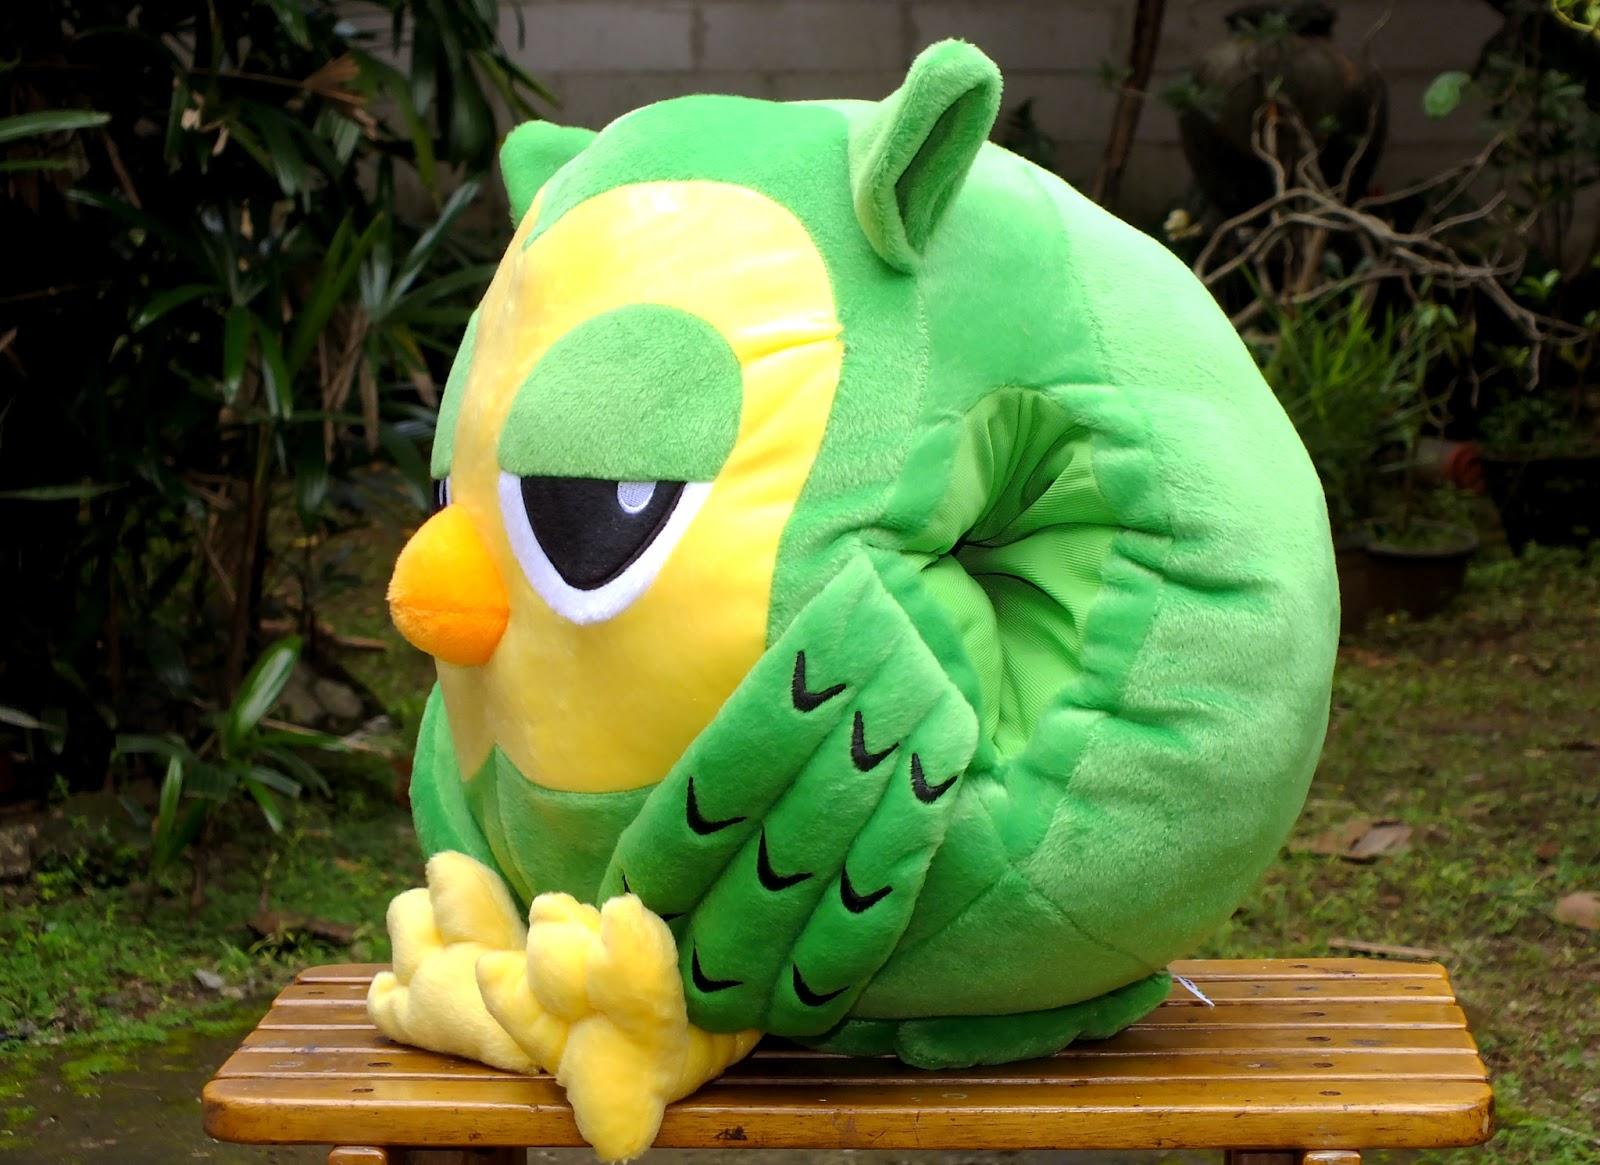 jual boneka tangan roumang burung hantu · Boneka lucu bentuk burung hantu 3b455b5909